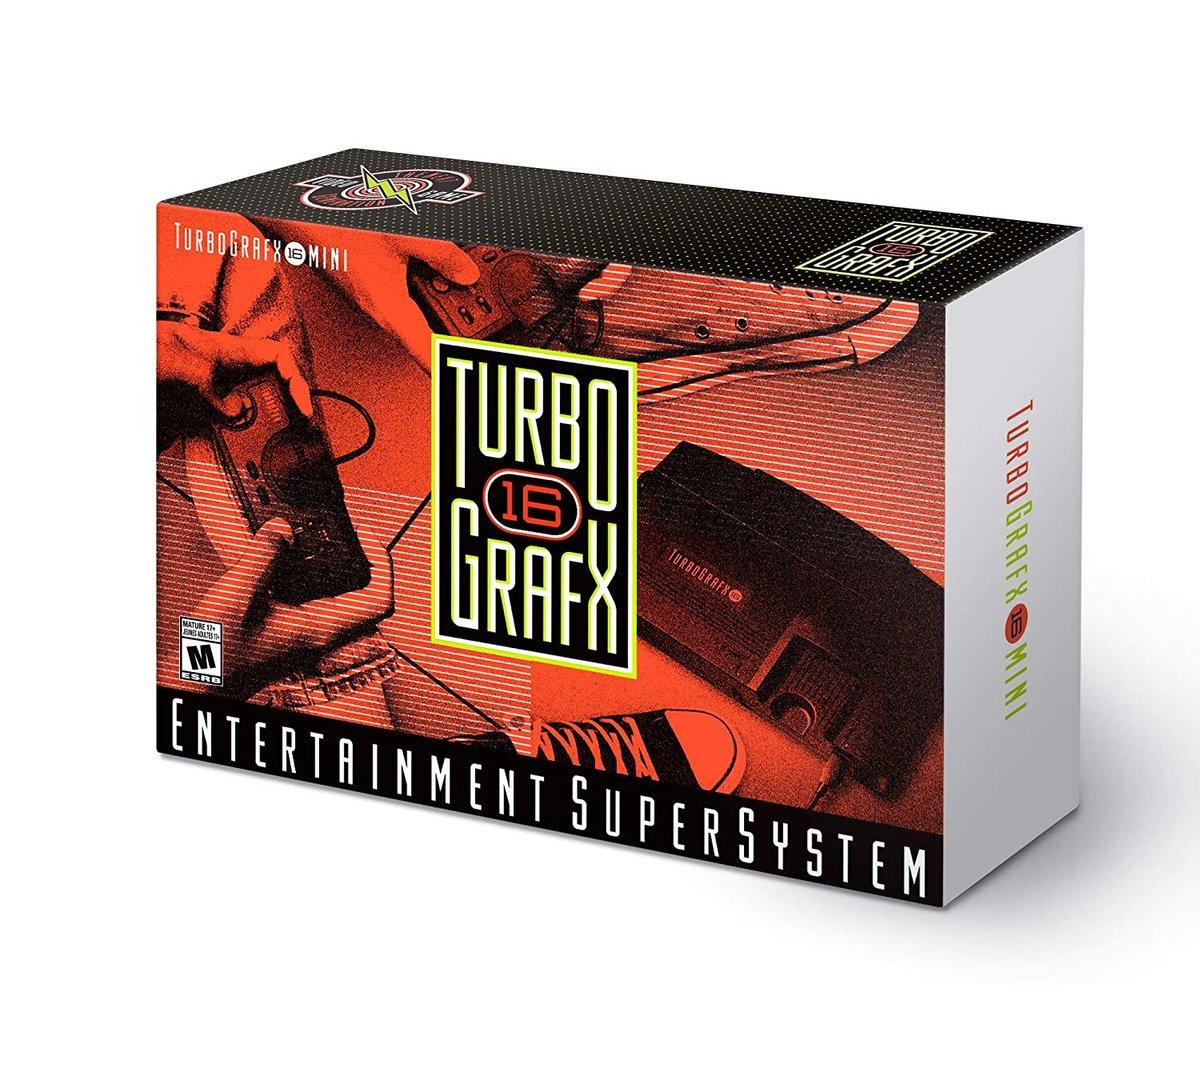 TurboGrafx